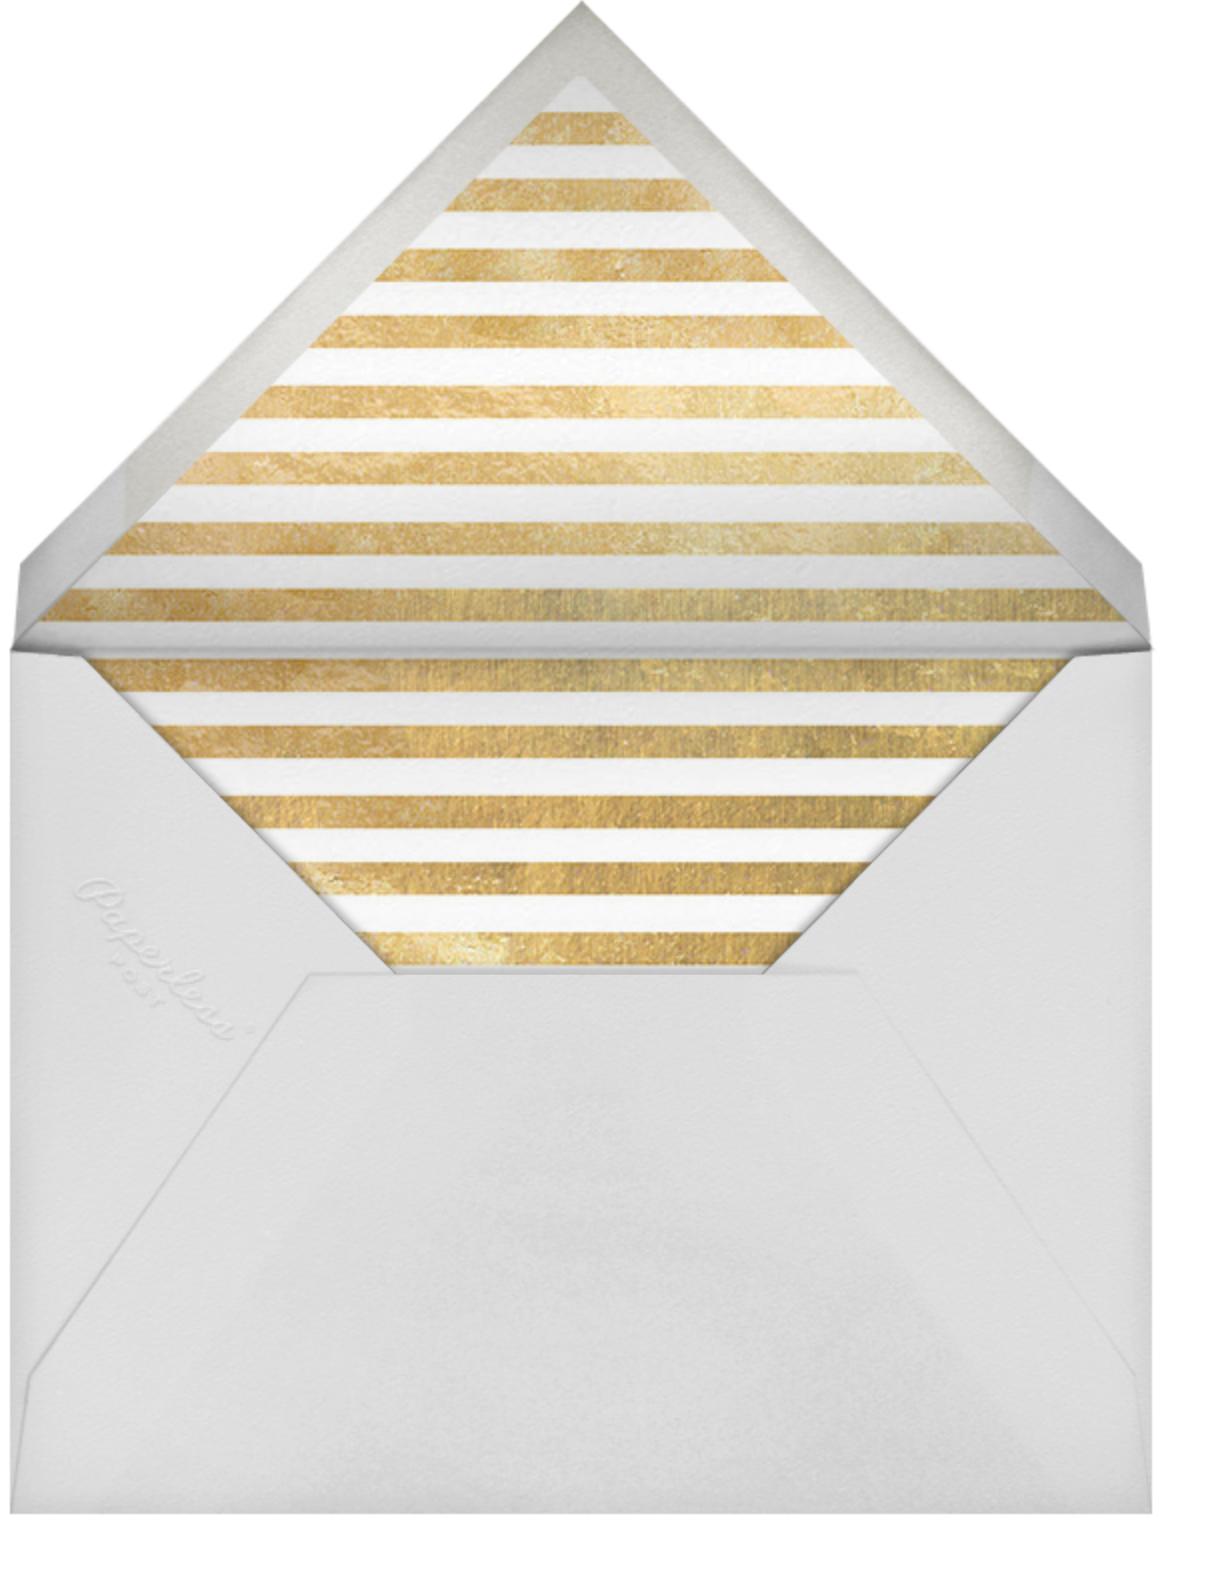 Confetti (Invitation) - Aqua/Gold - kate spade new york - All - envelope back